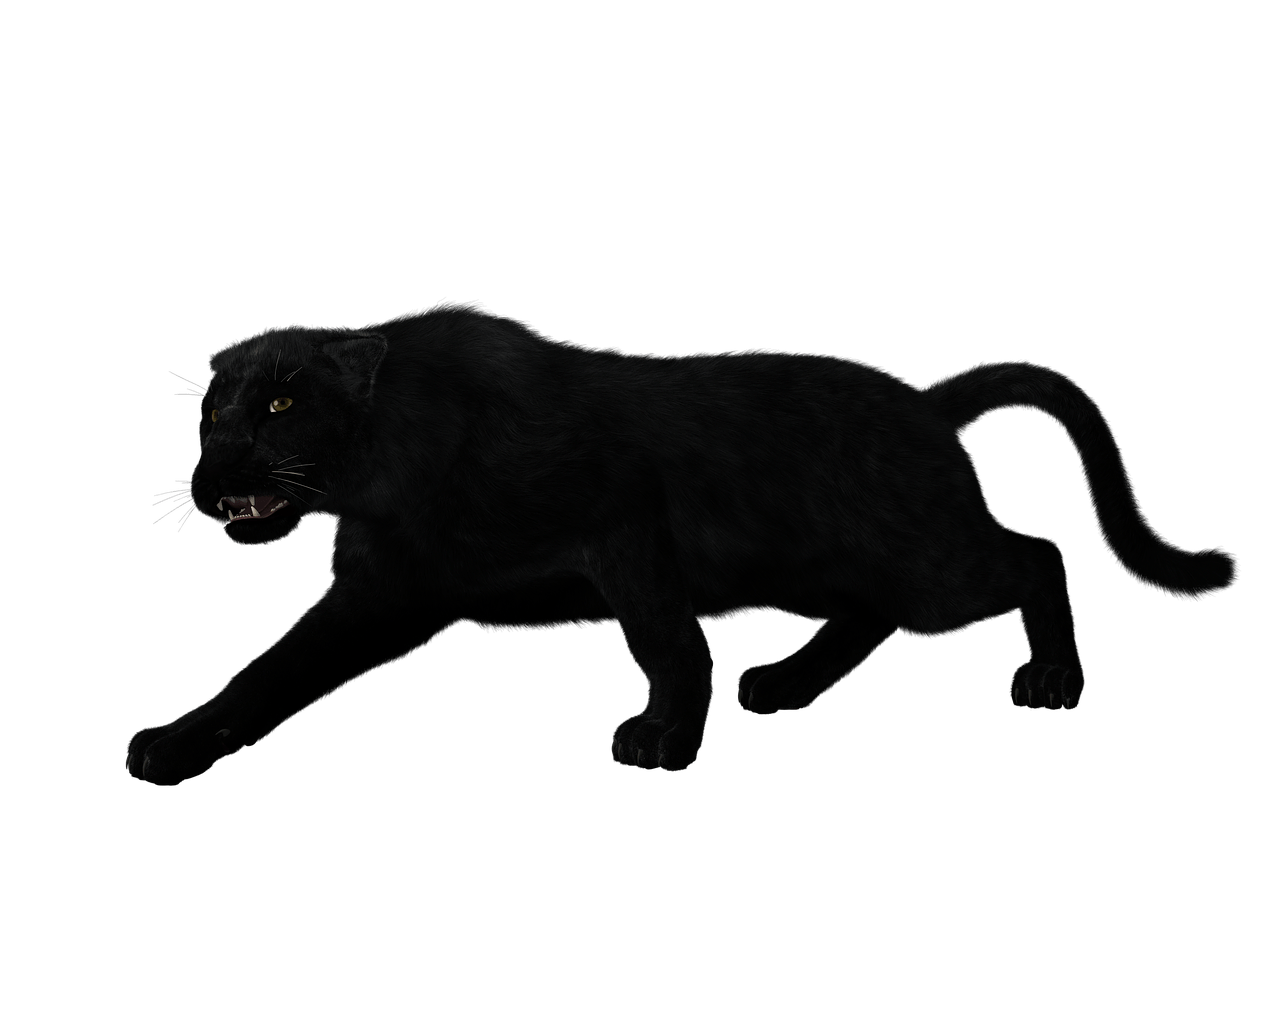 Black panther full body